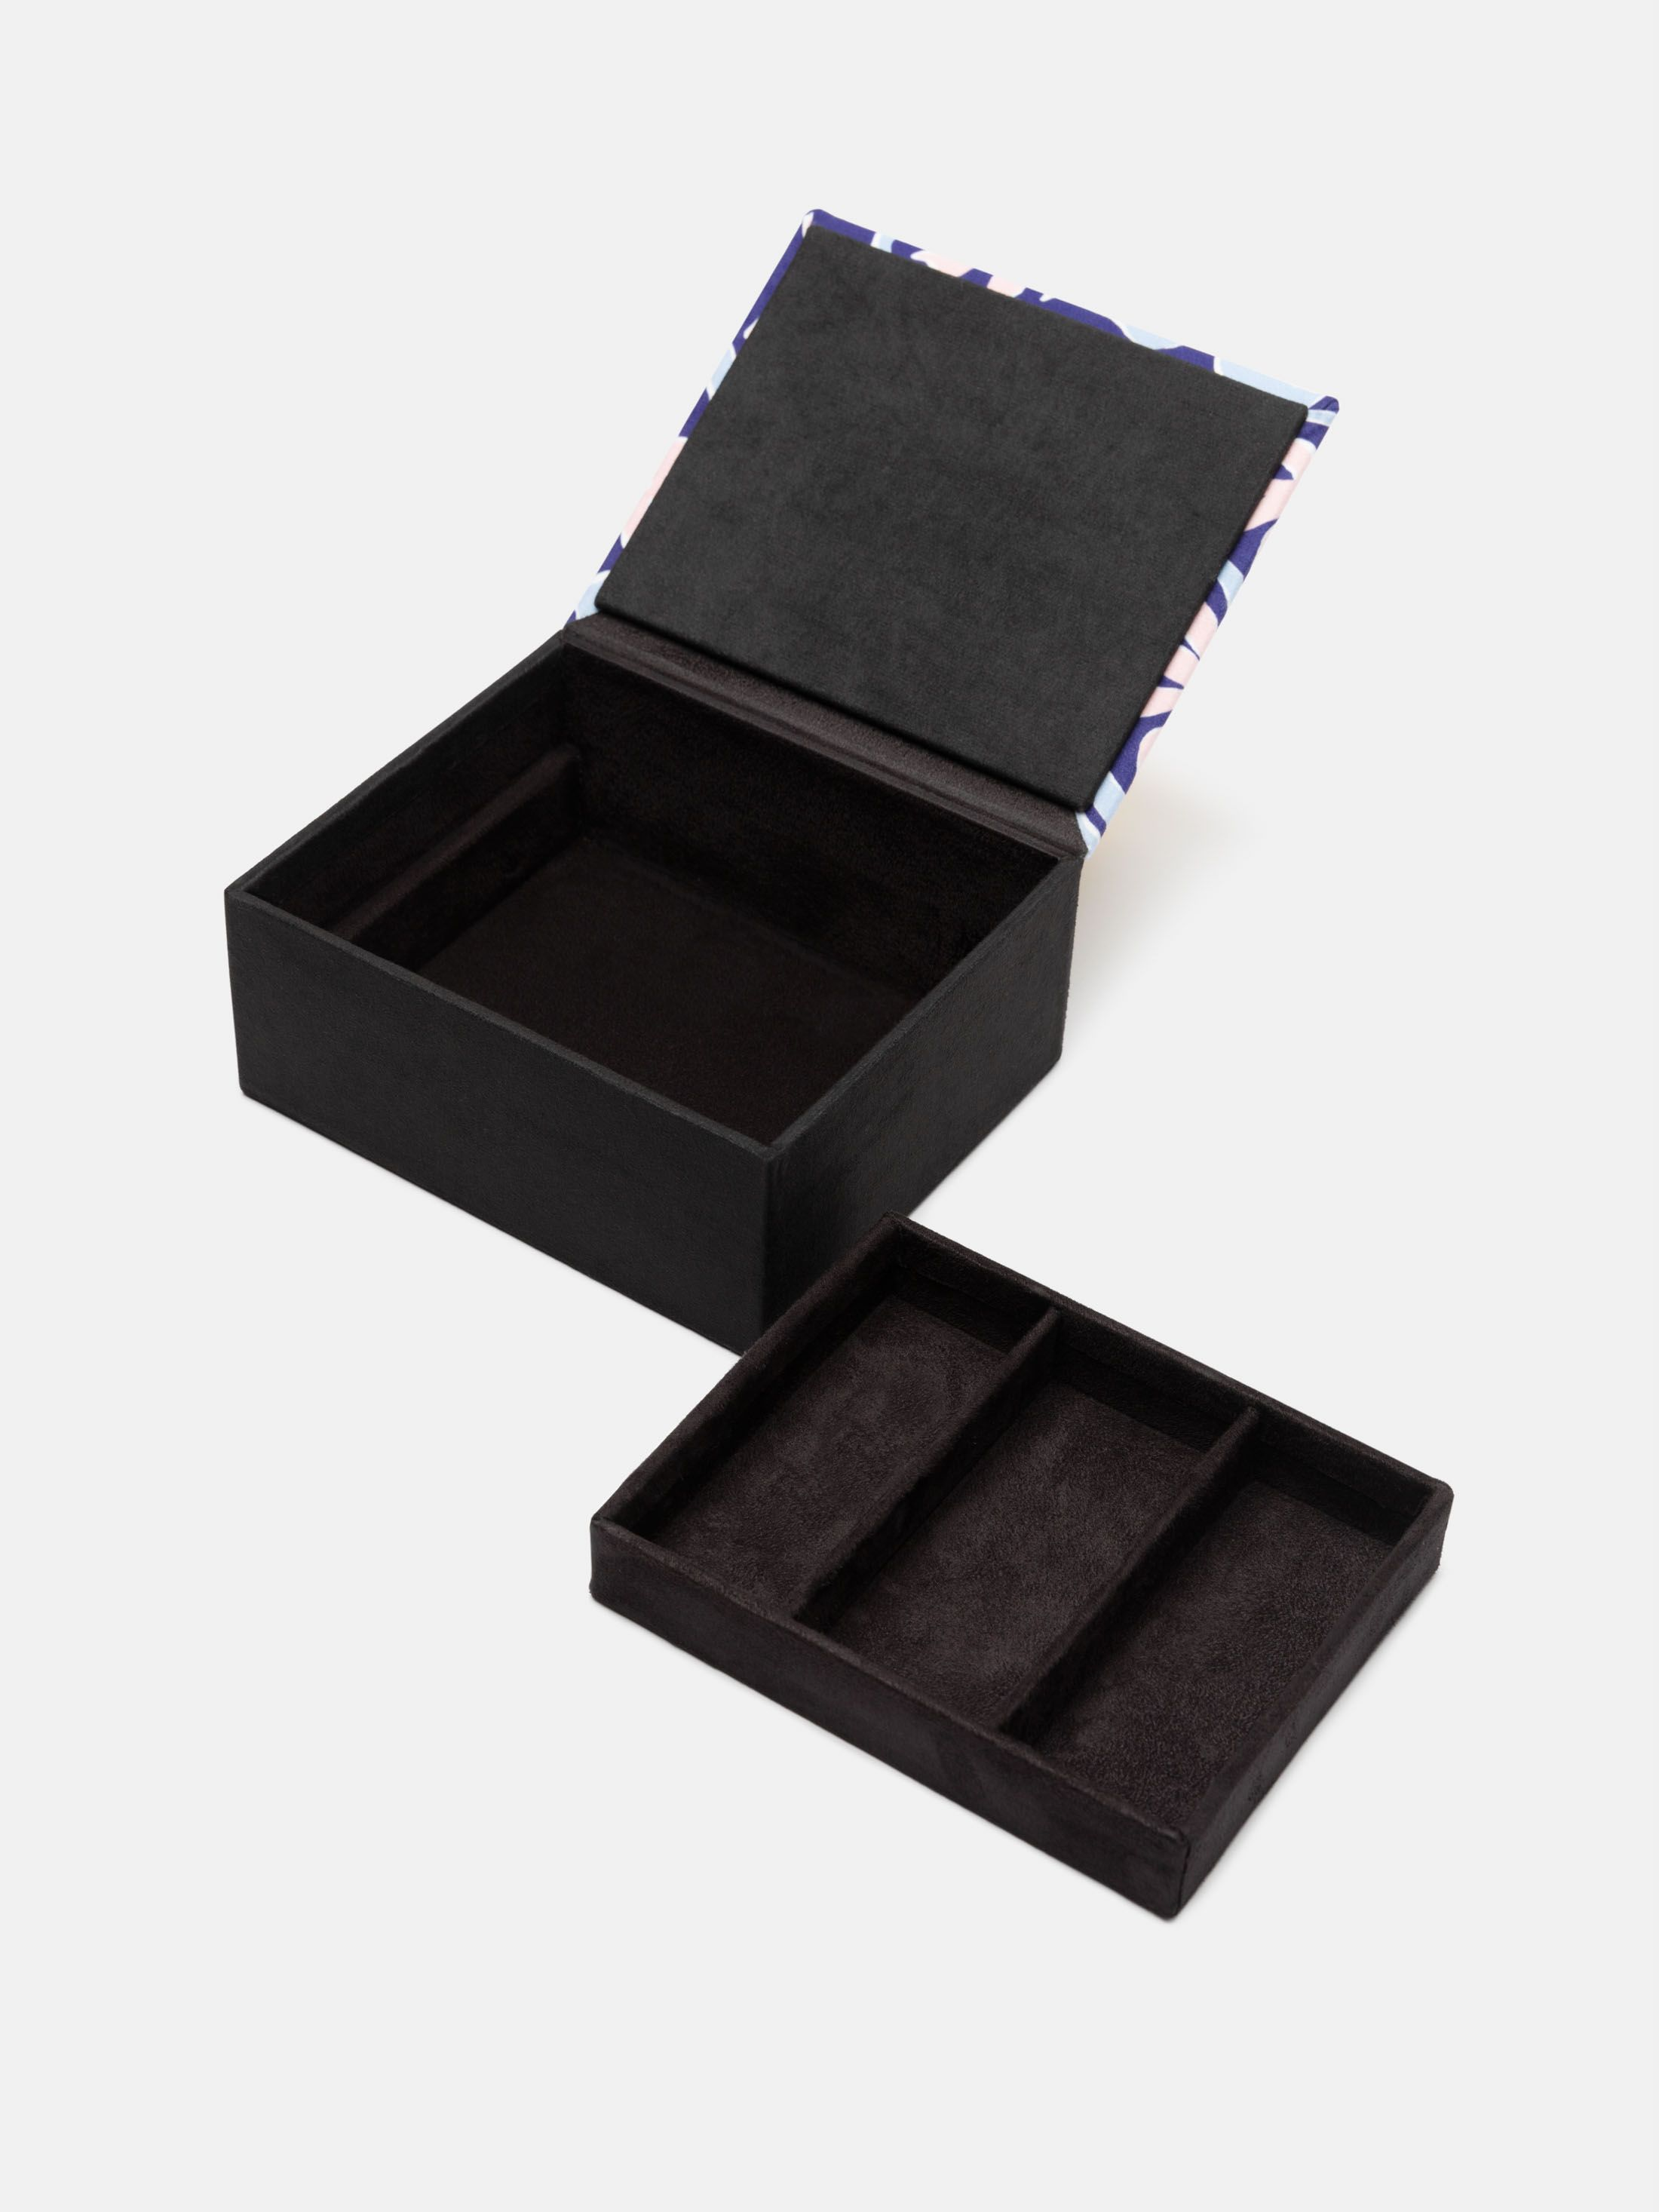 Bespoke Jewellery Box in 2 Sizes